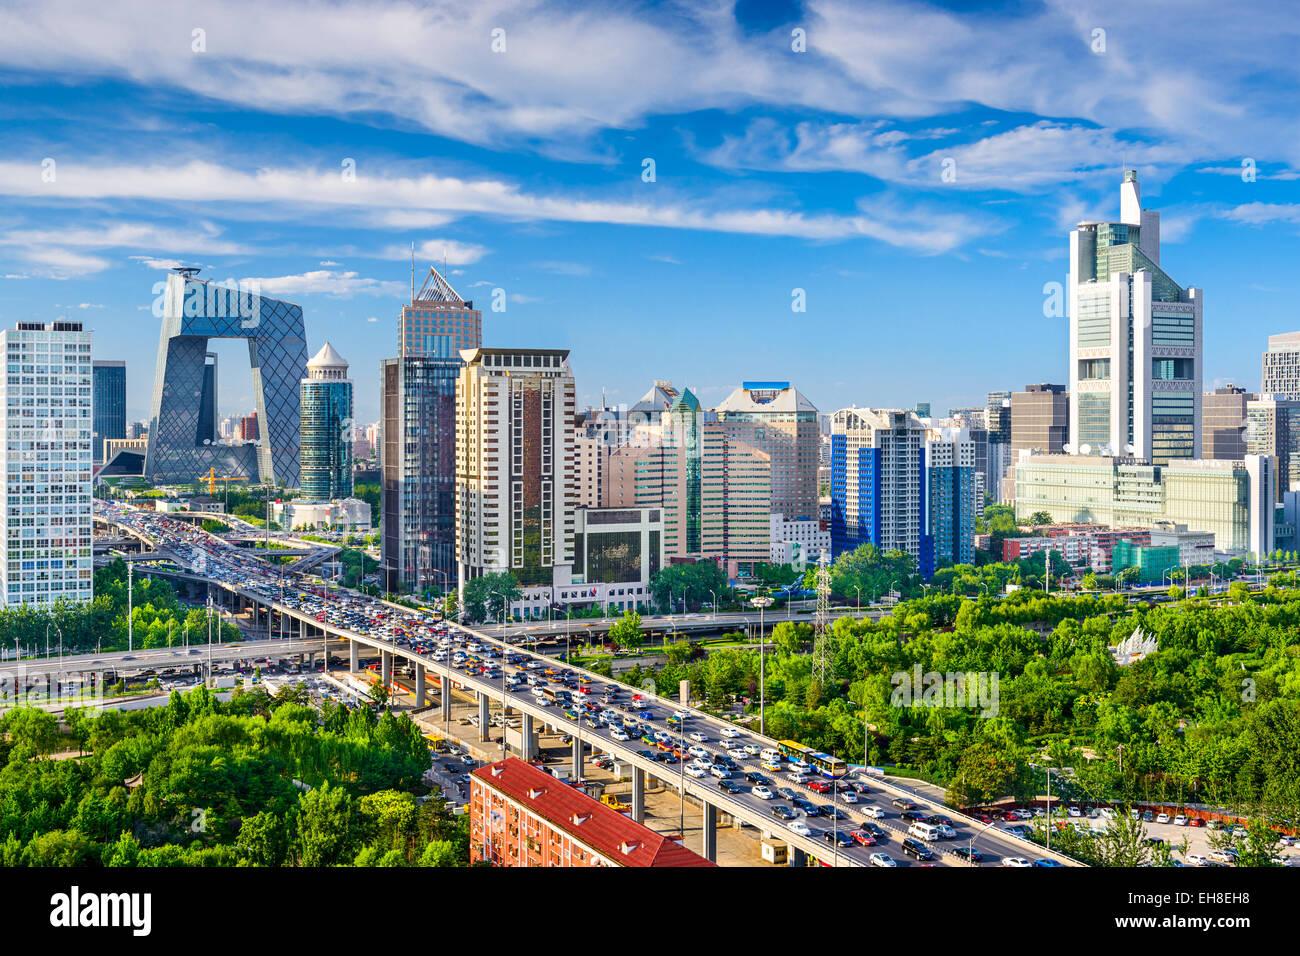 Beijing, China cityscape at the CBD. Stock Photo